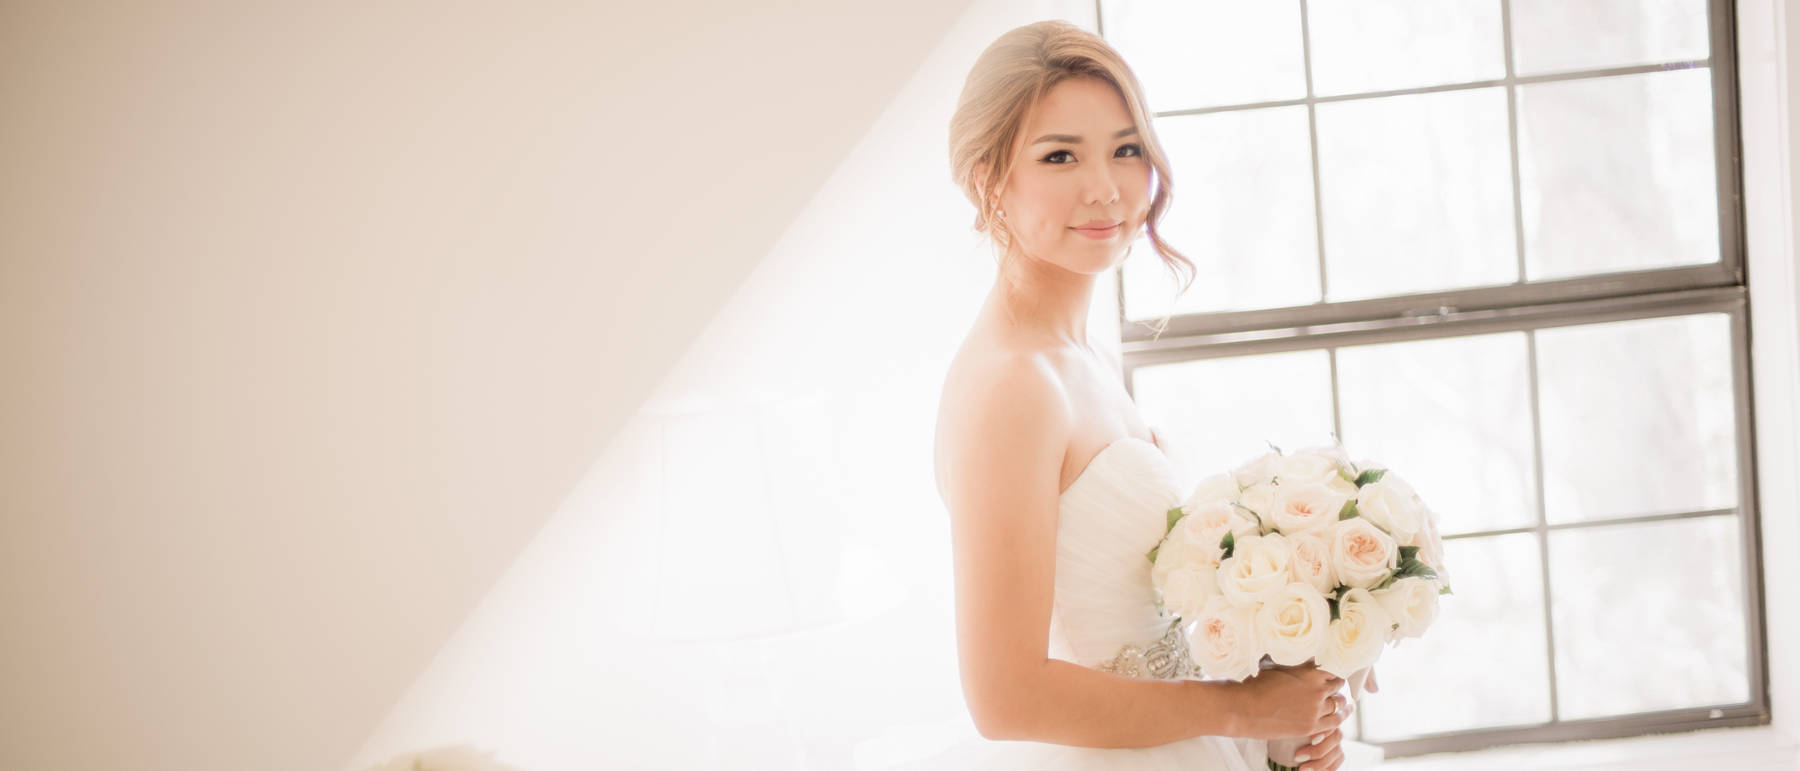 johnandjoseph-wedding-photographer-hz-slider-300